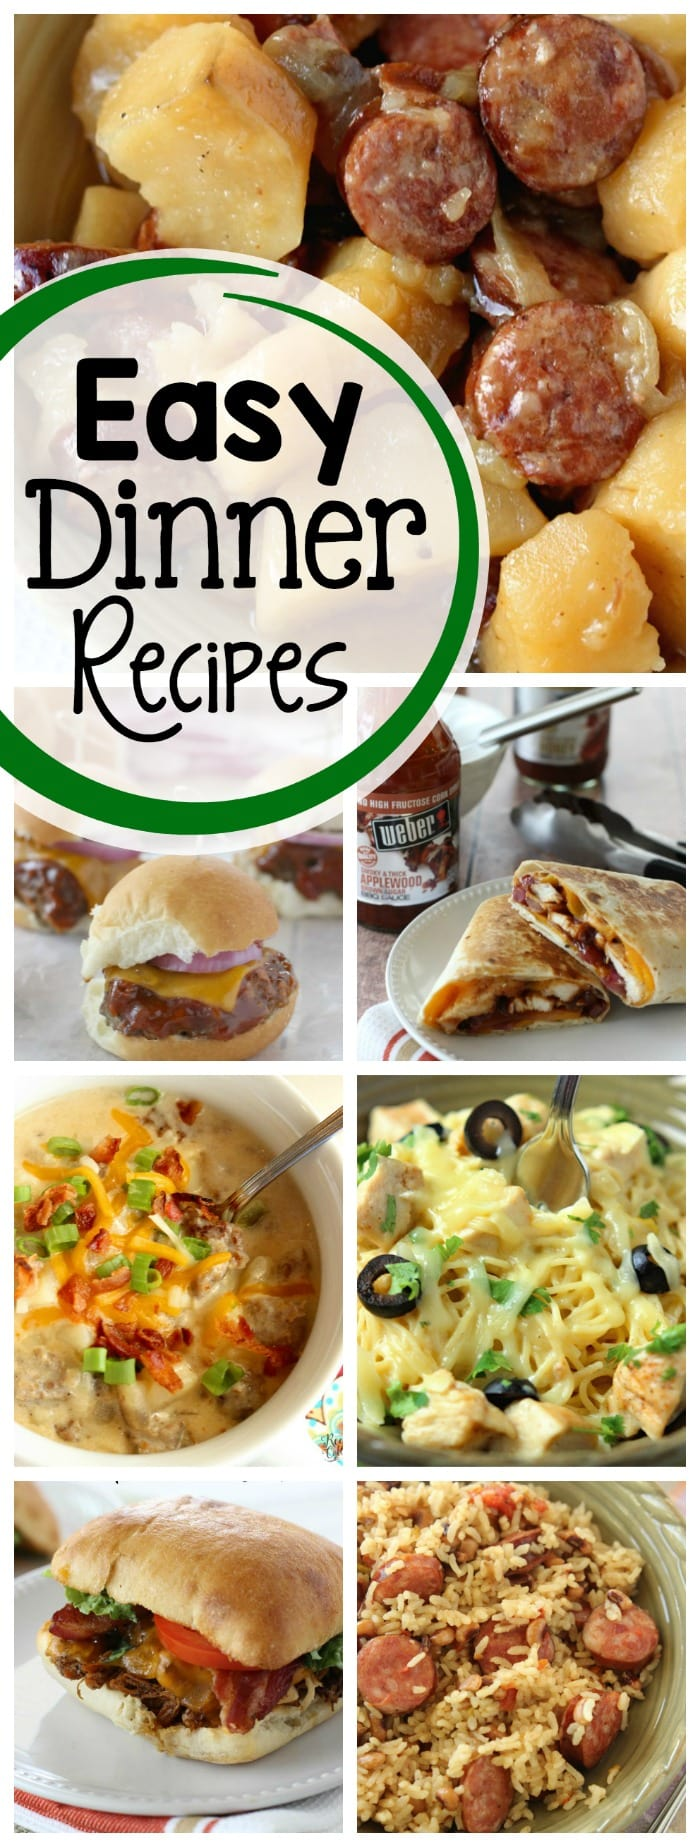 15 Best Weeknight Dinner Recipes